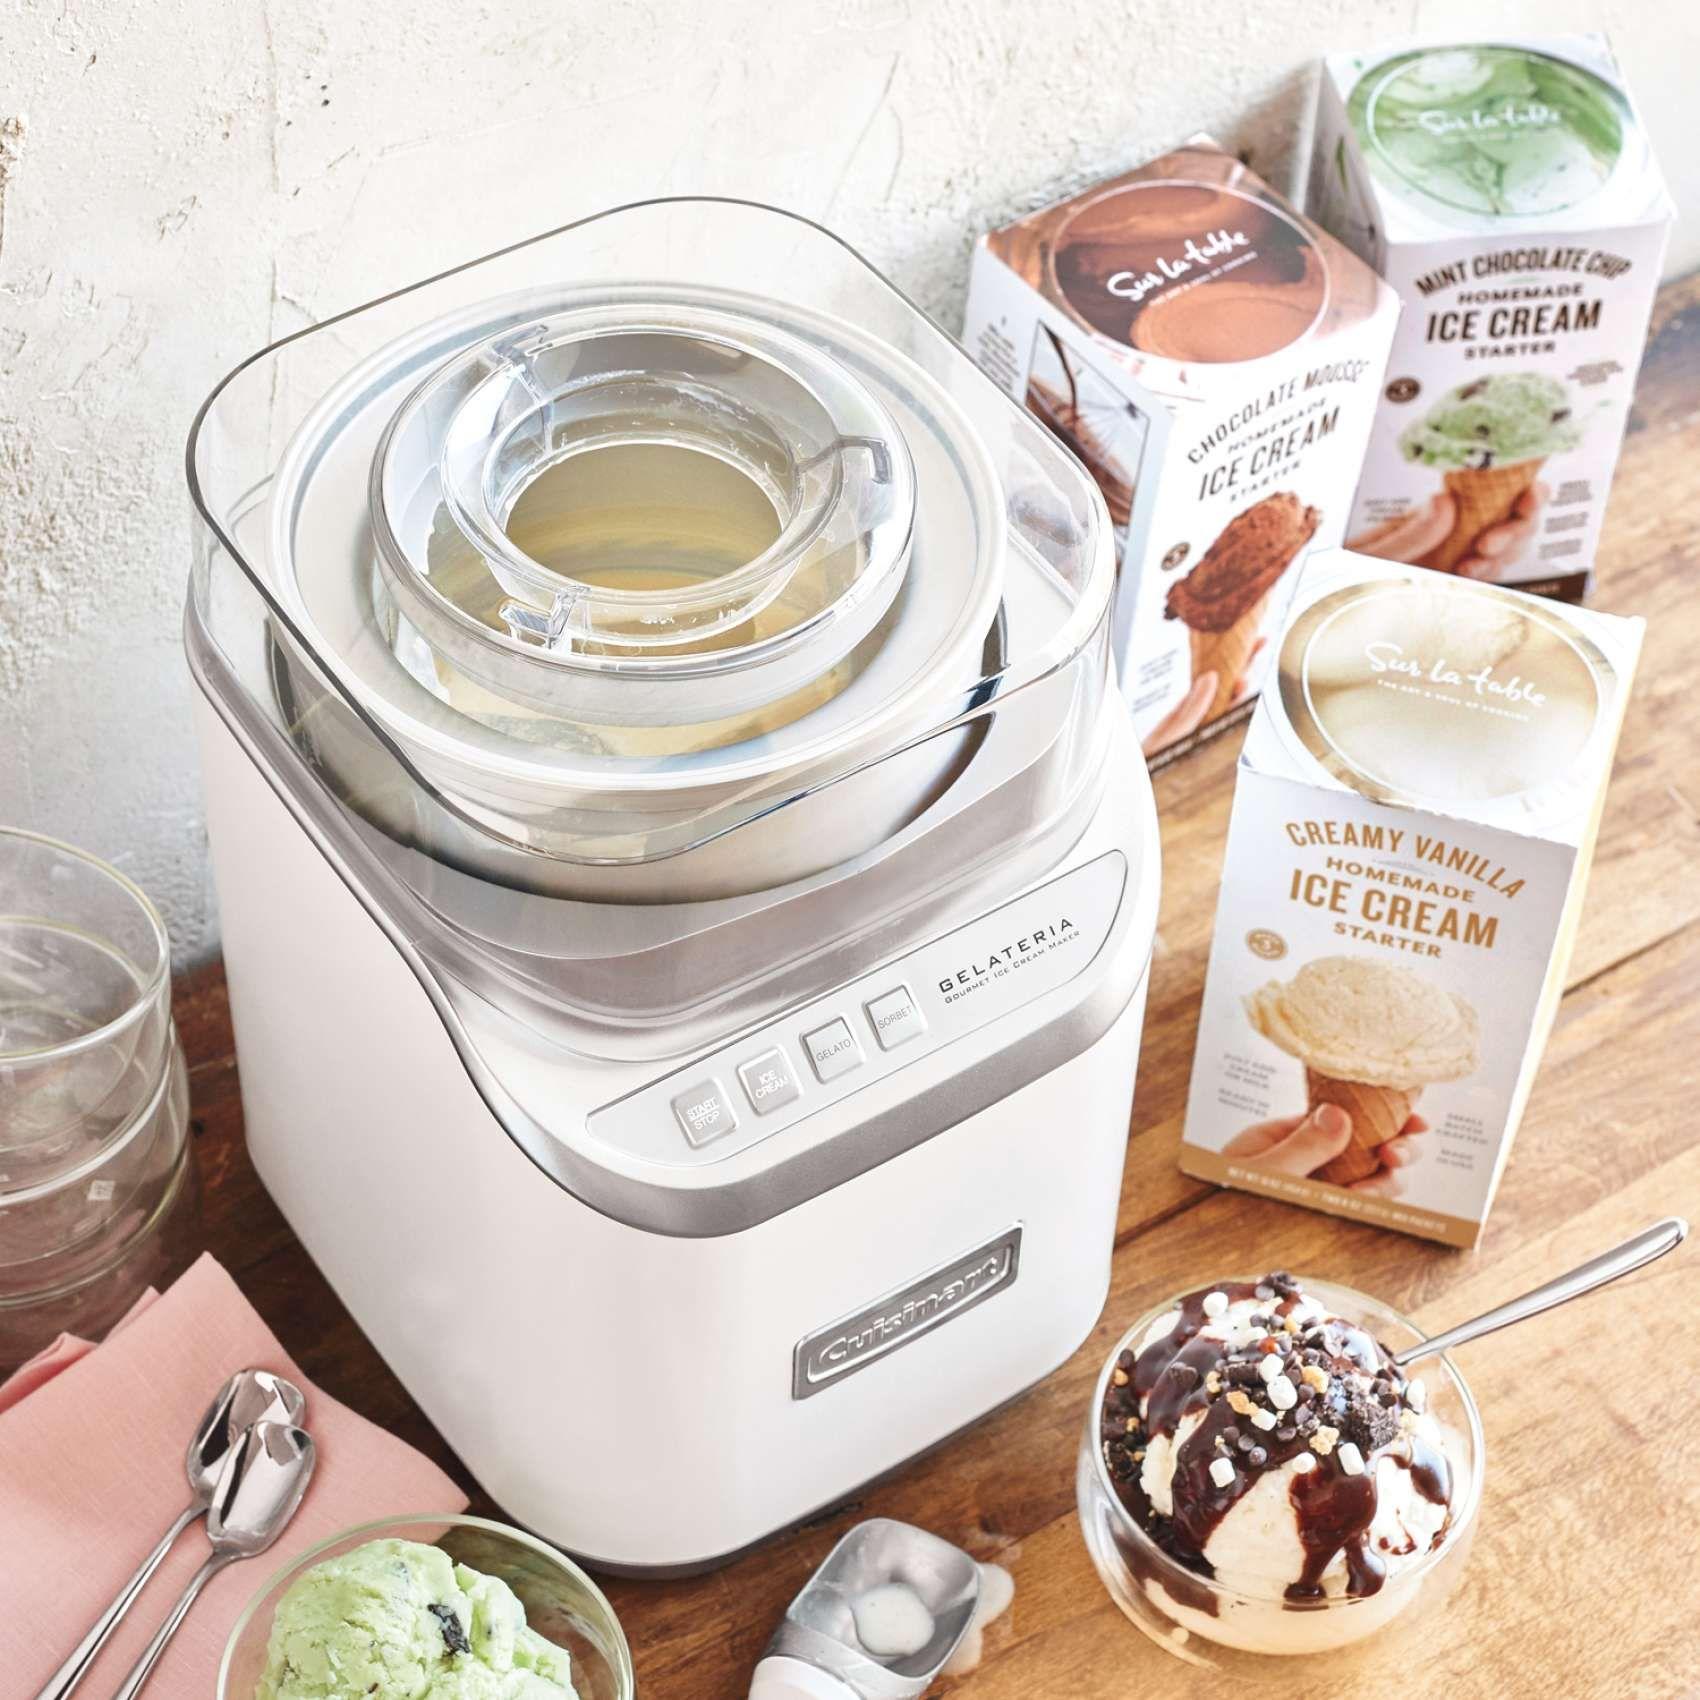 Cuisinart Gelateria Ice Cream Maker Ice Cream Maker Homemade Ice Ice Cream